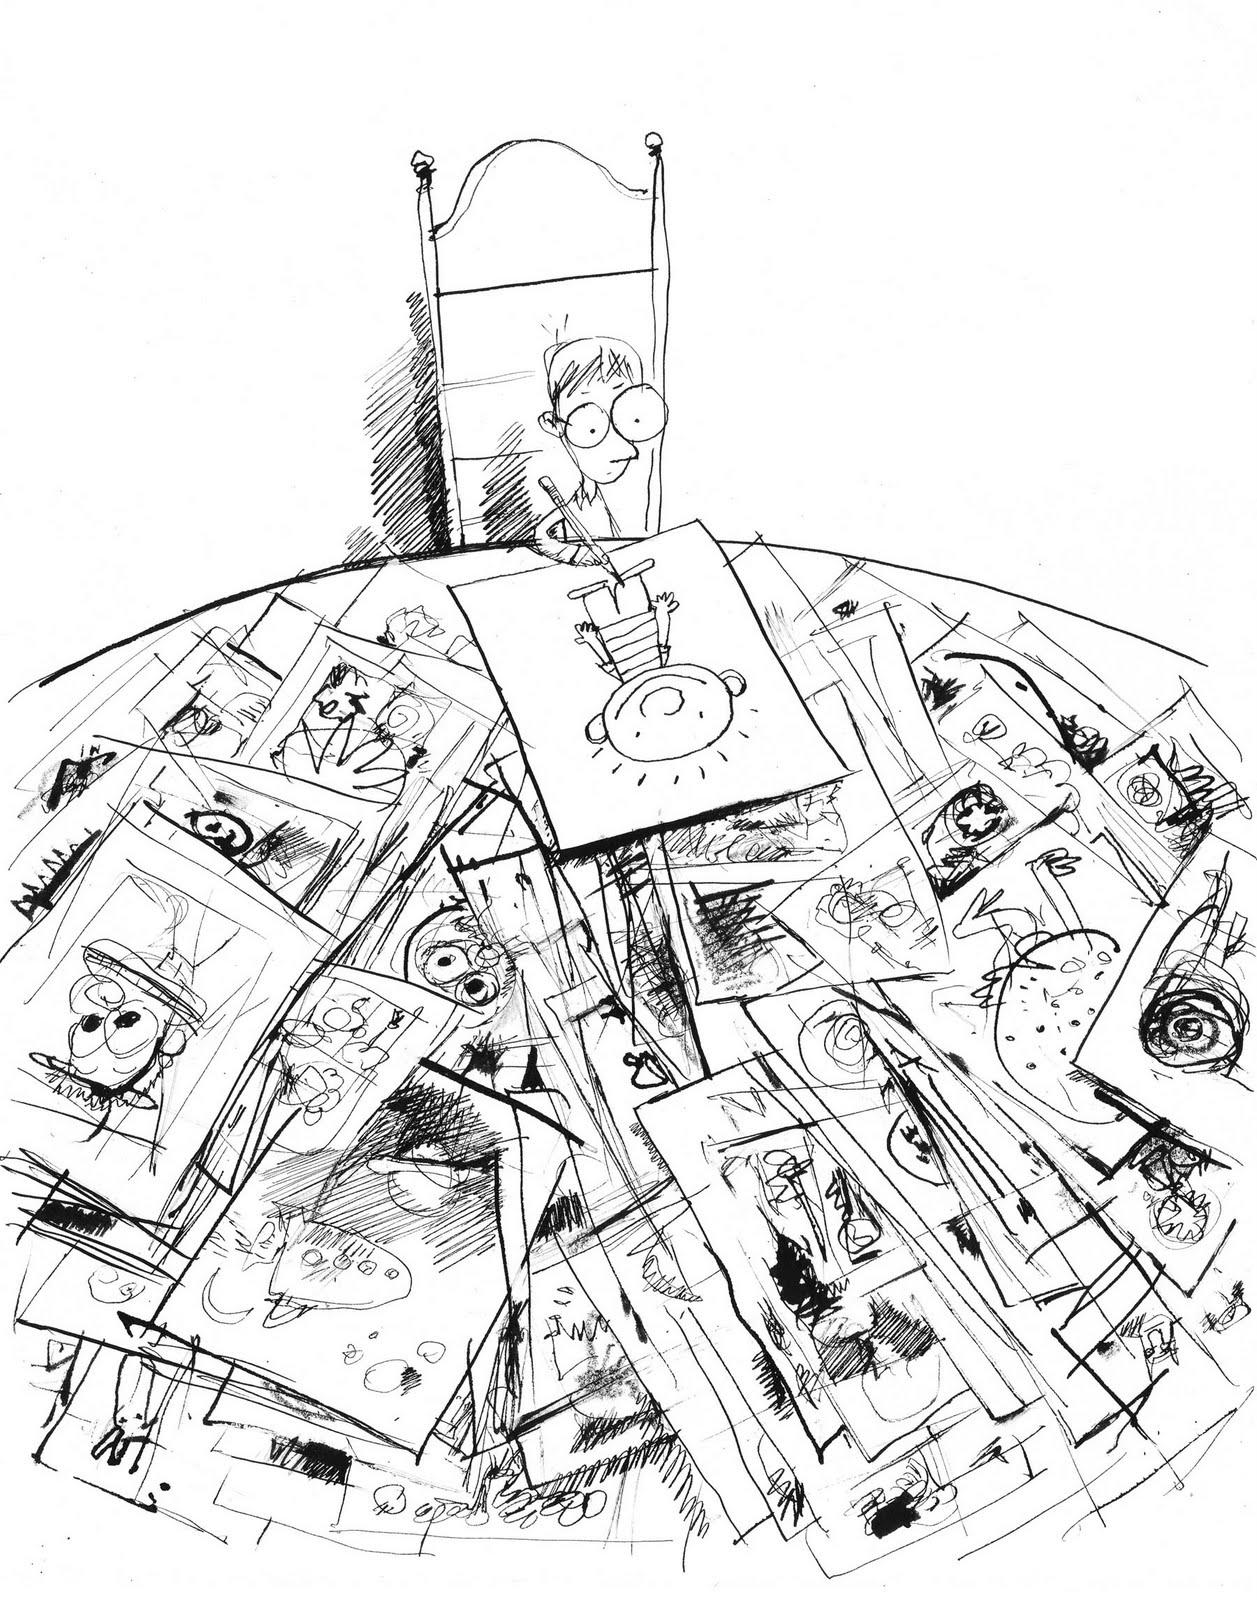 cul de sac: Autobiography in Three Drawings